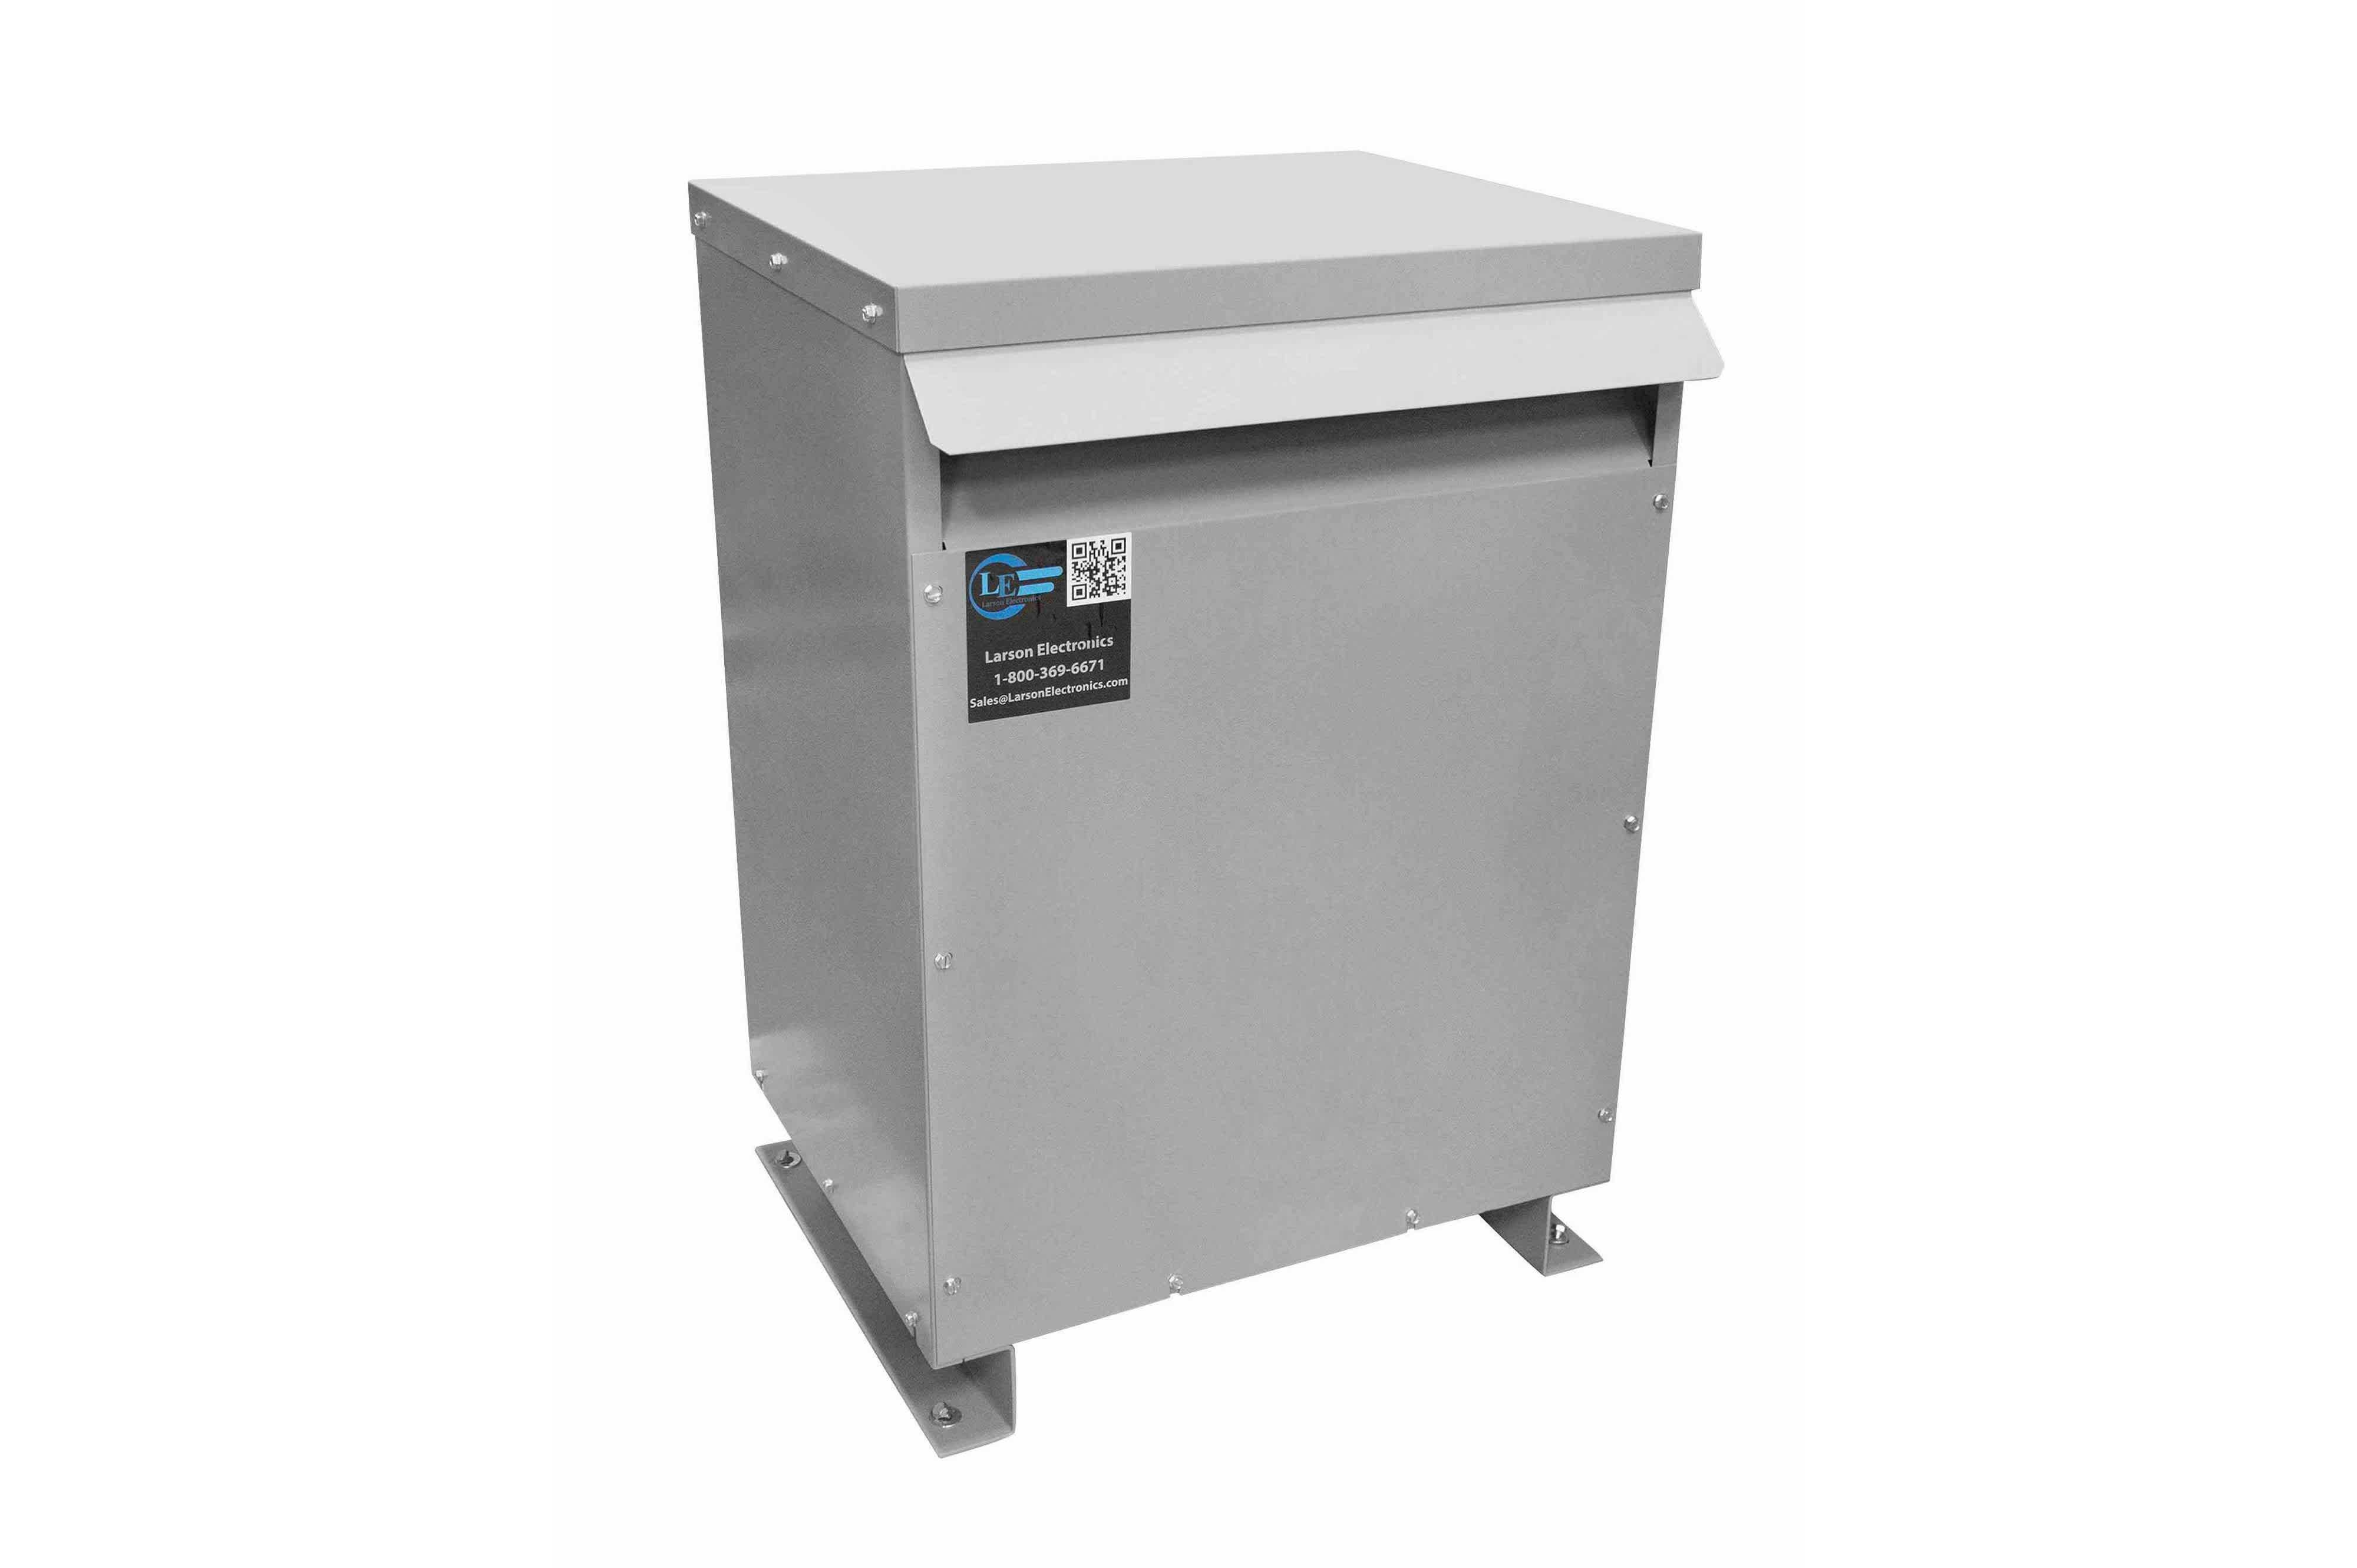 38 kVA 3PH Isolation Transformer, 575V Wye Primary, 480V Delta Secondary, N3R, Ventilated, 60 Hz